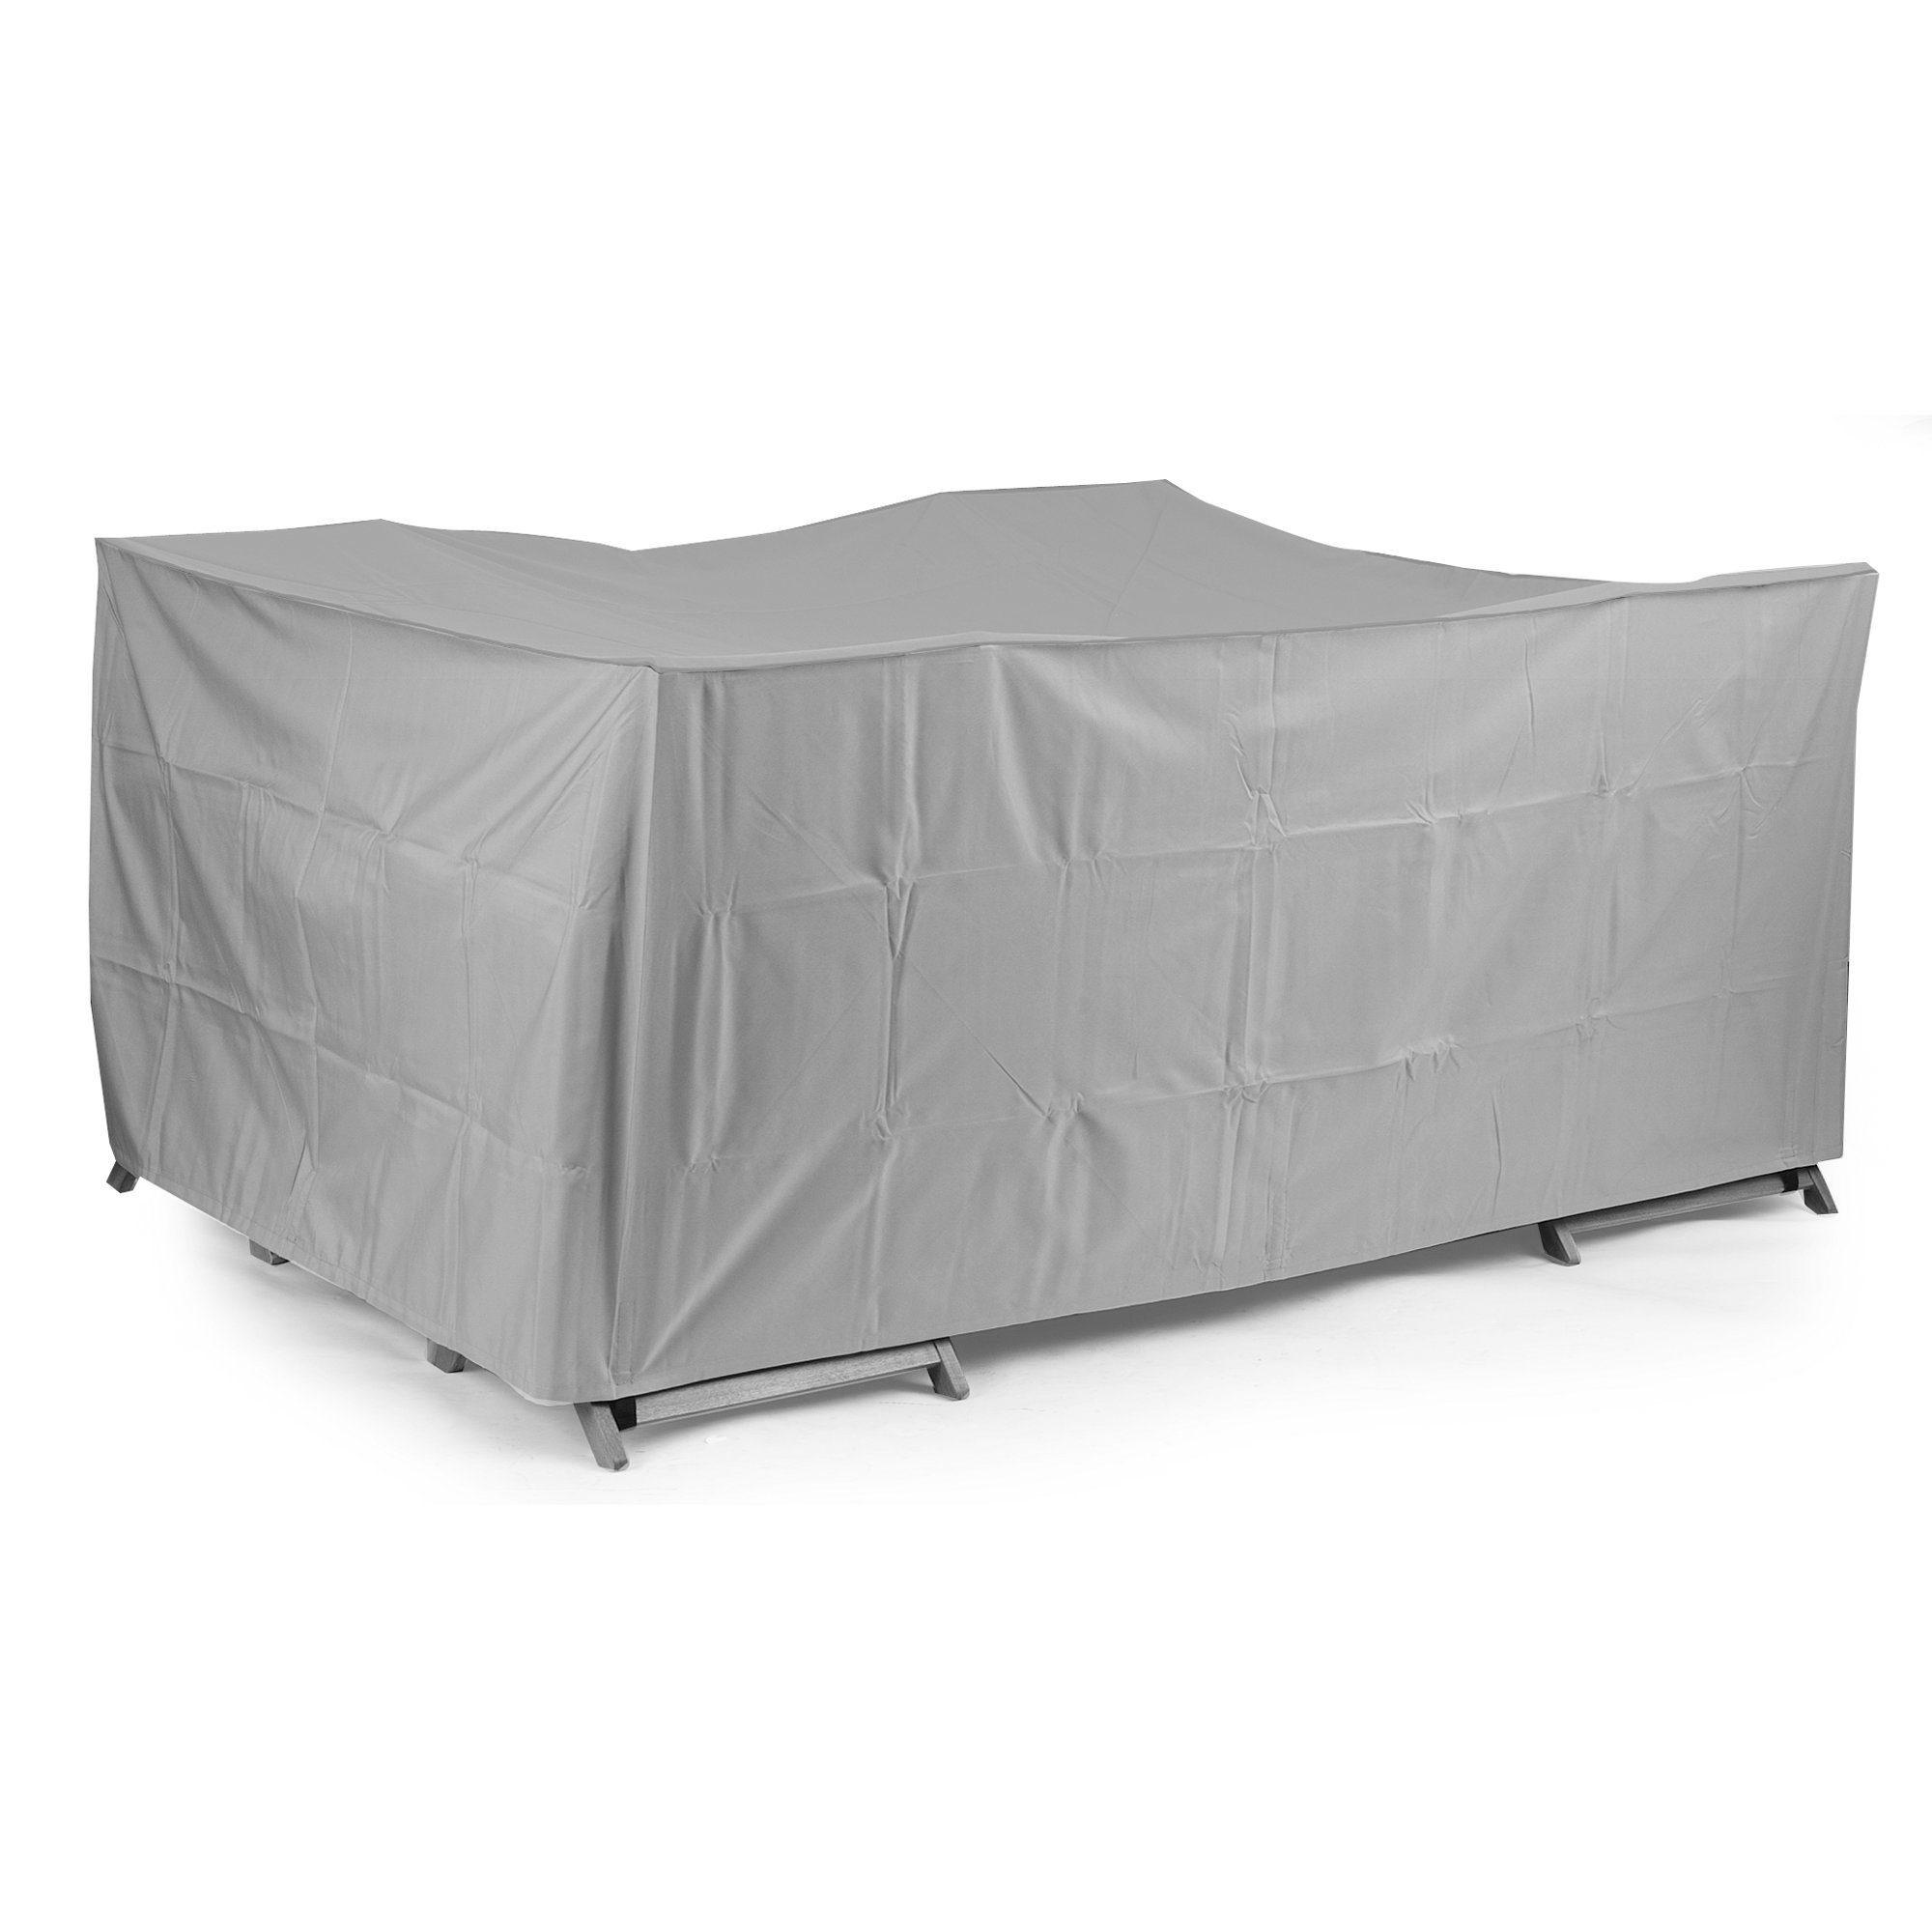 Möbelskydd 130x140 cm, höjd 65 cm